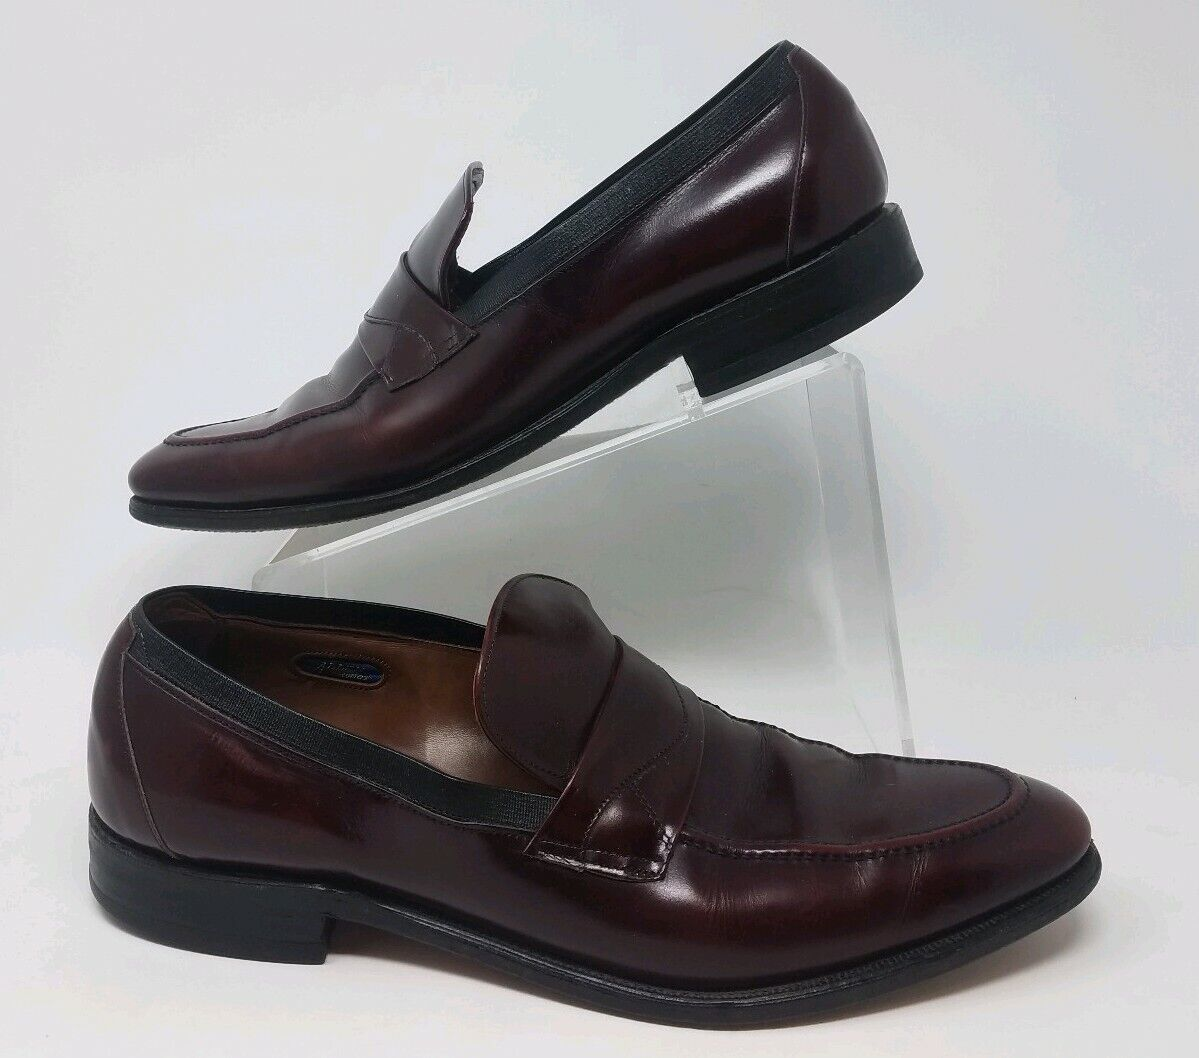 Allen Edmonds Sutton Mens Burgundy Slip On Loafers new shoes shoes Size 12 MUSA